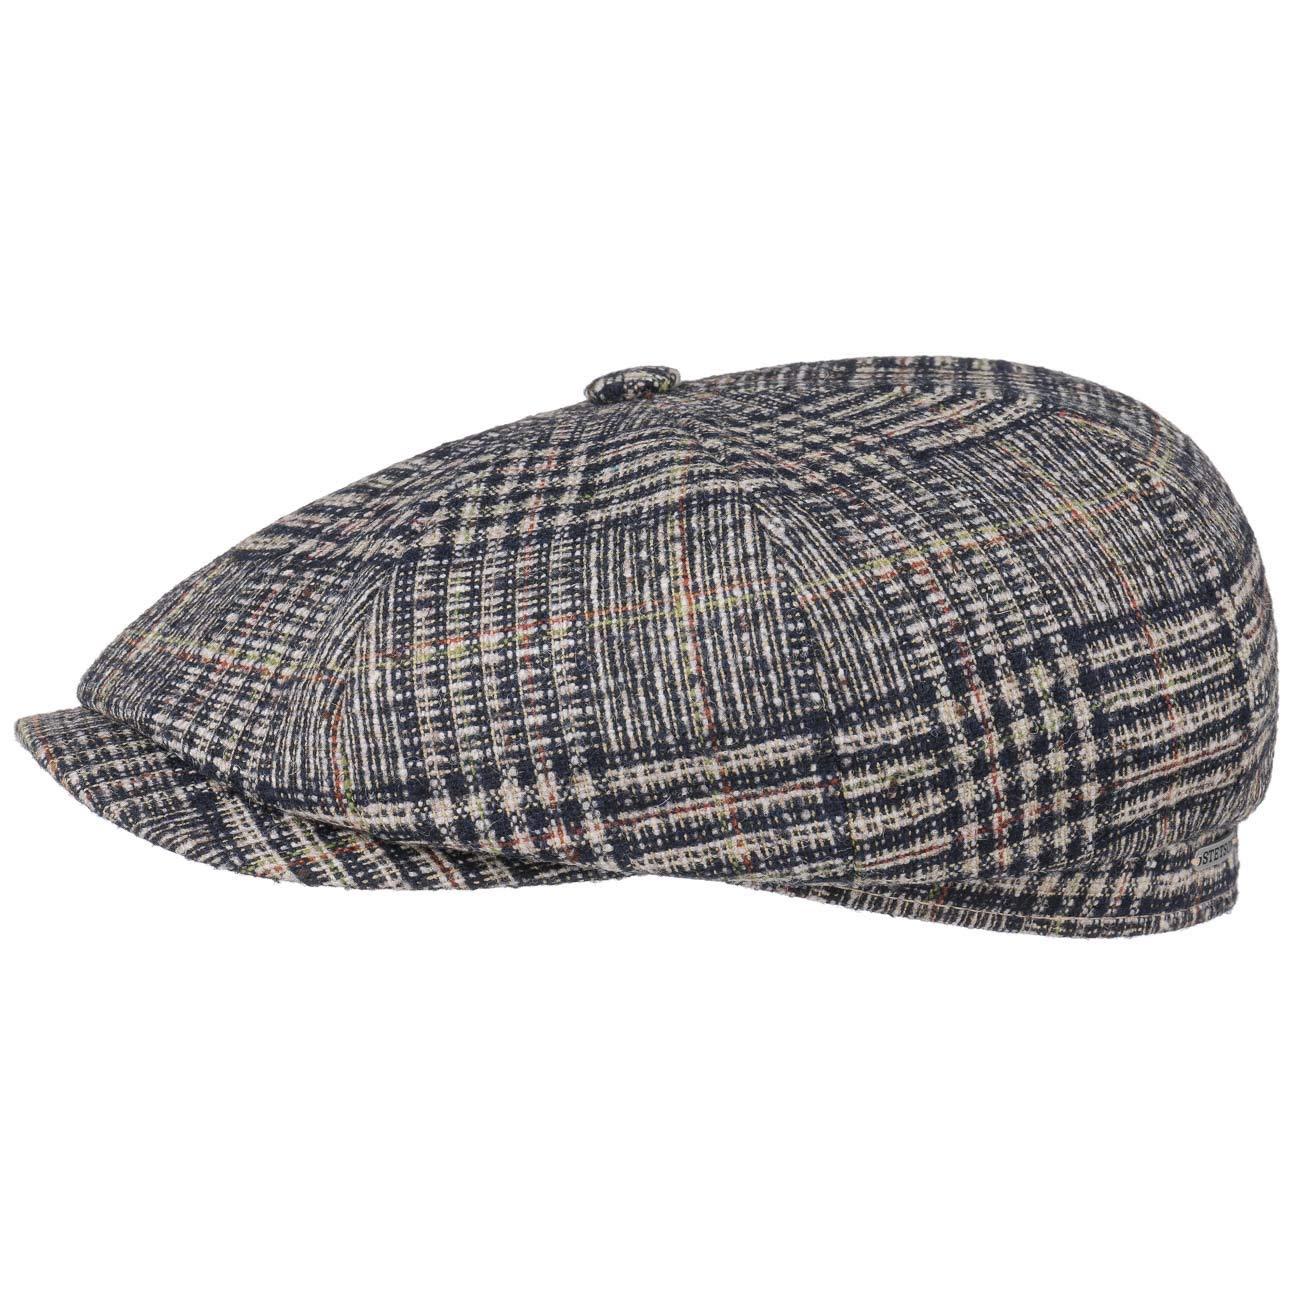 Stetson Hatteras Wool Plaid Flat Cap Men Made in The EU